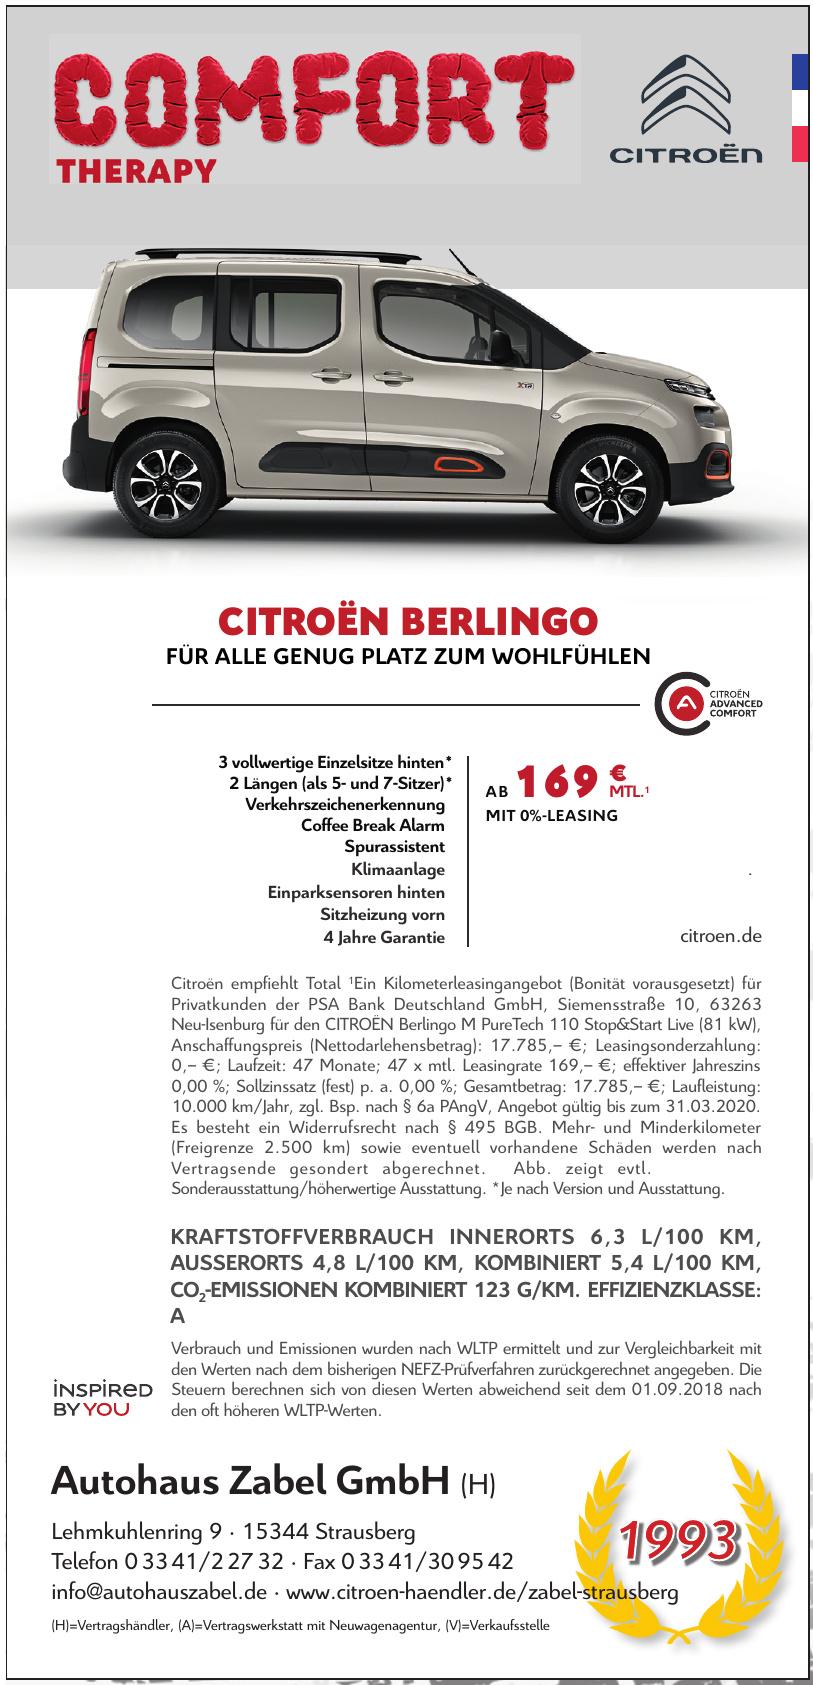 Citroën Autohaus Zabel GmbH